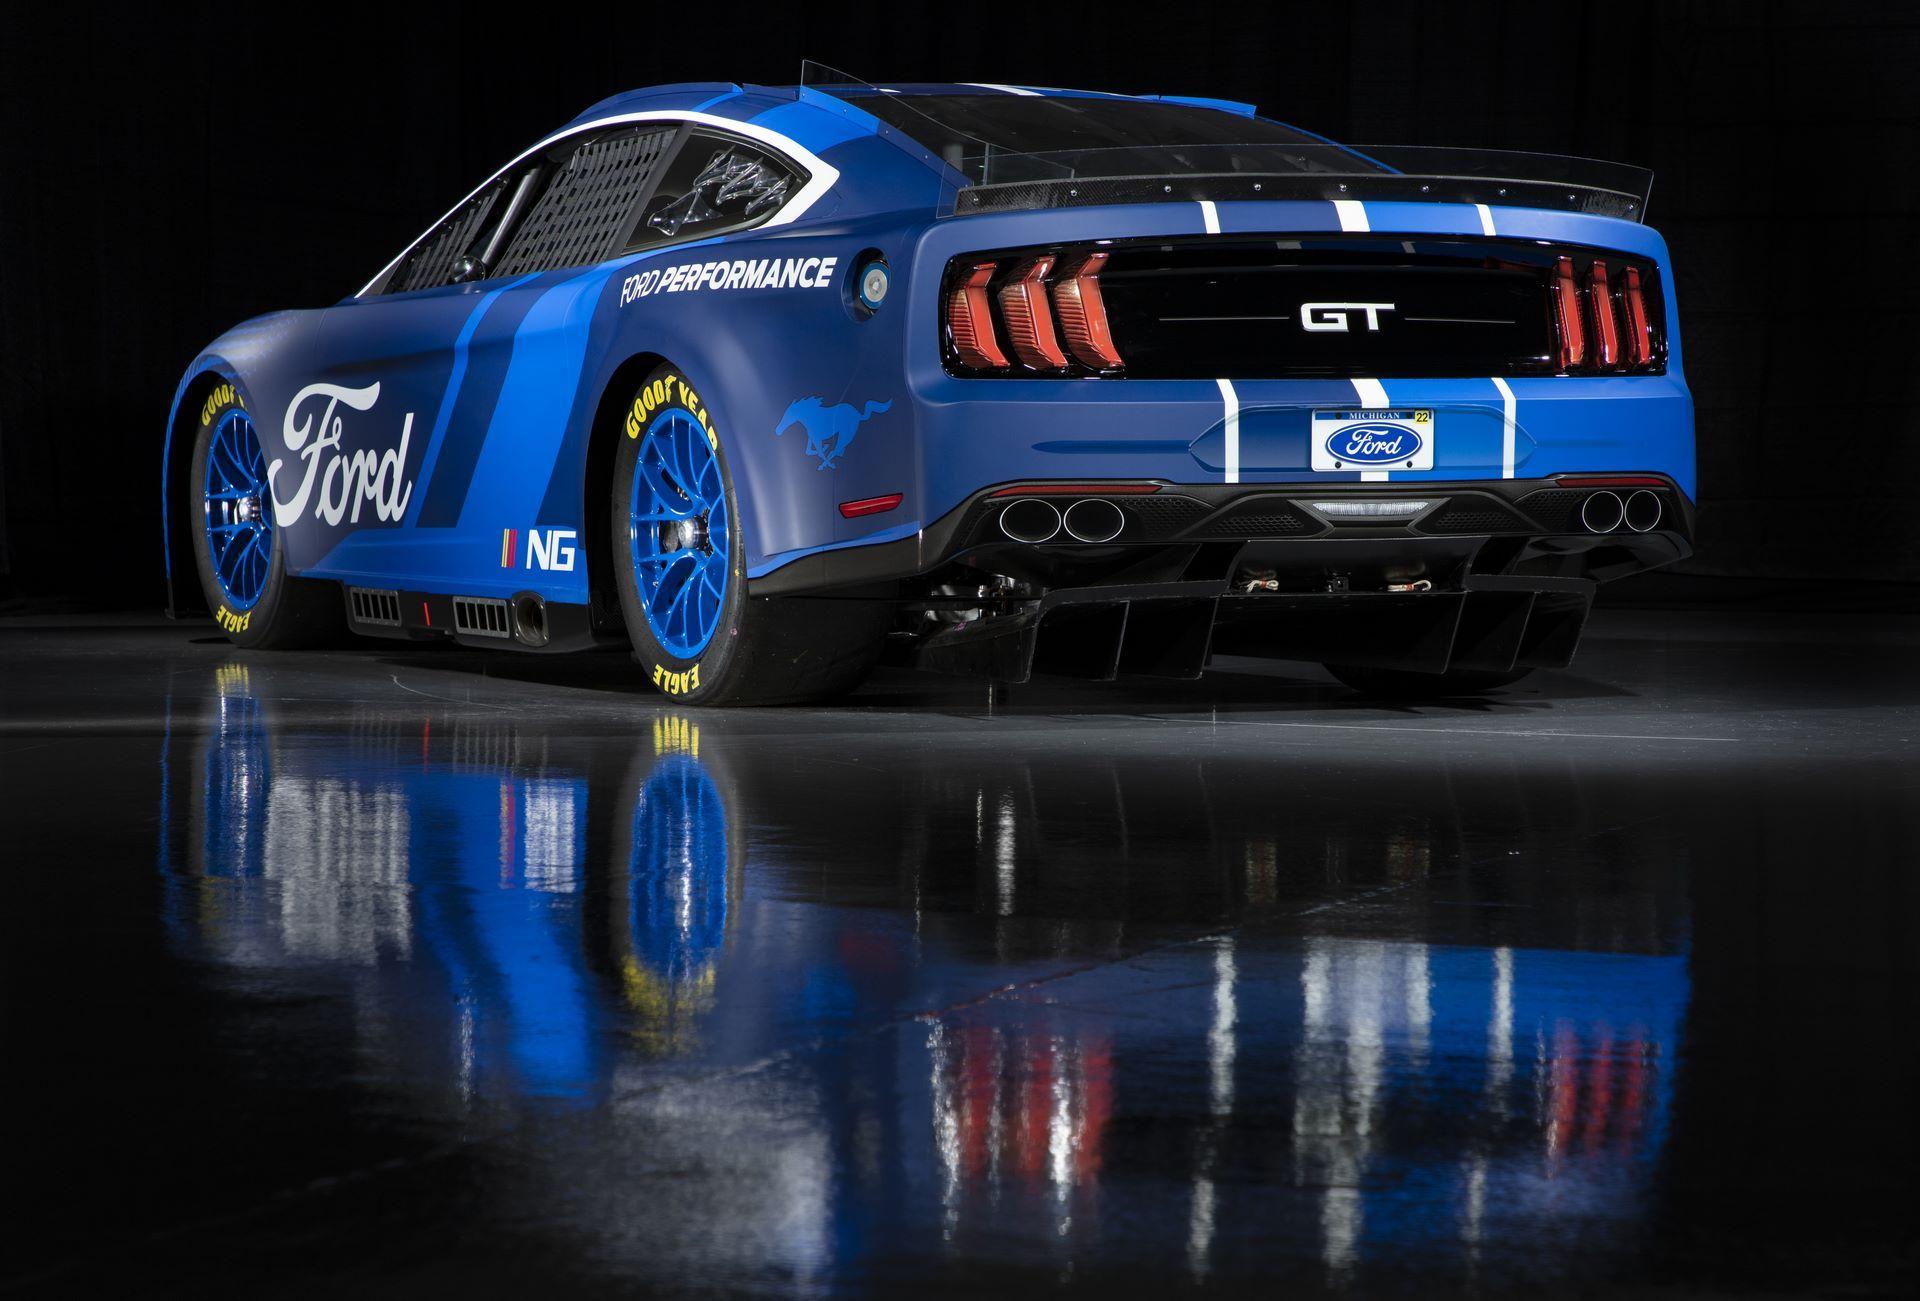 Ford-Mustang-Next-Gen-Nascar-19